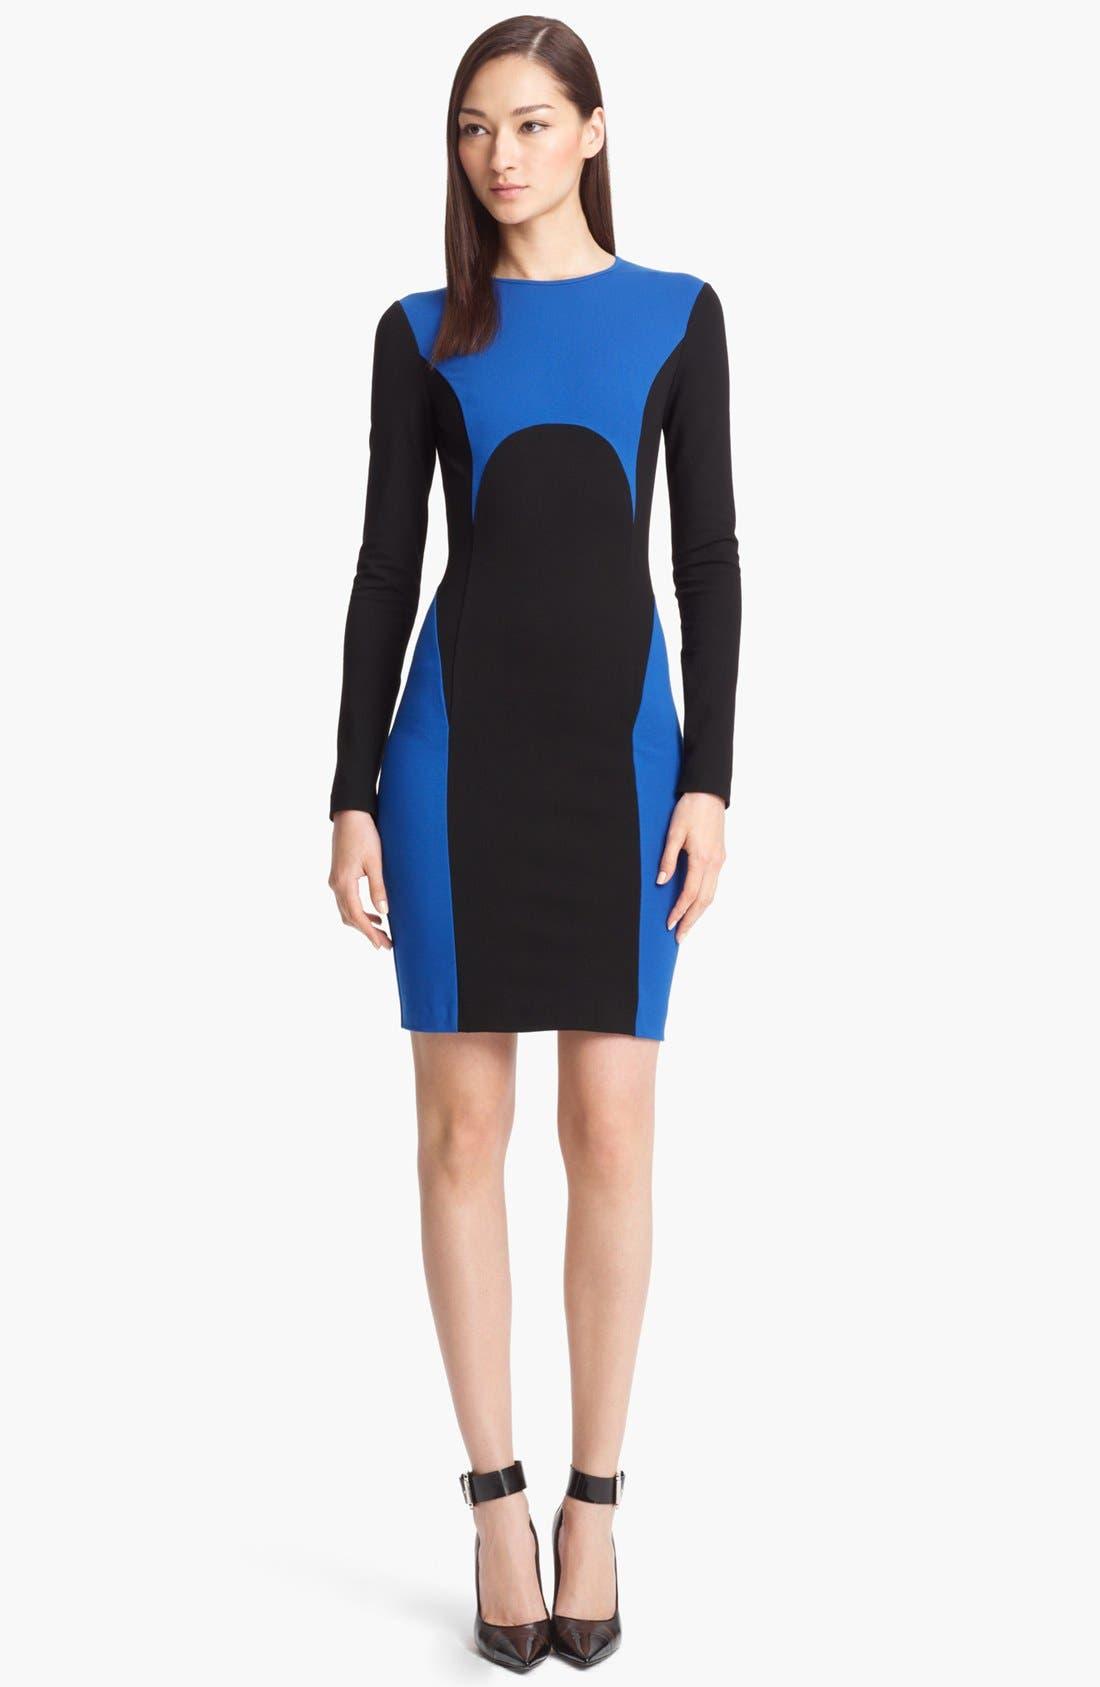 Alternate Image 1 Selected - Michael Kors Colorblock Jersey Dress